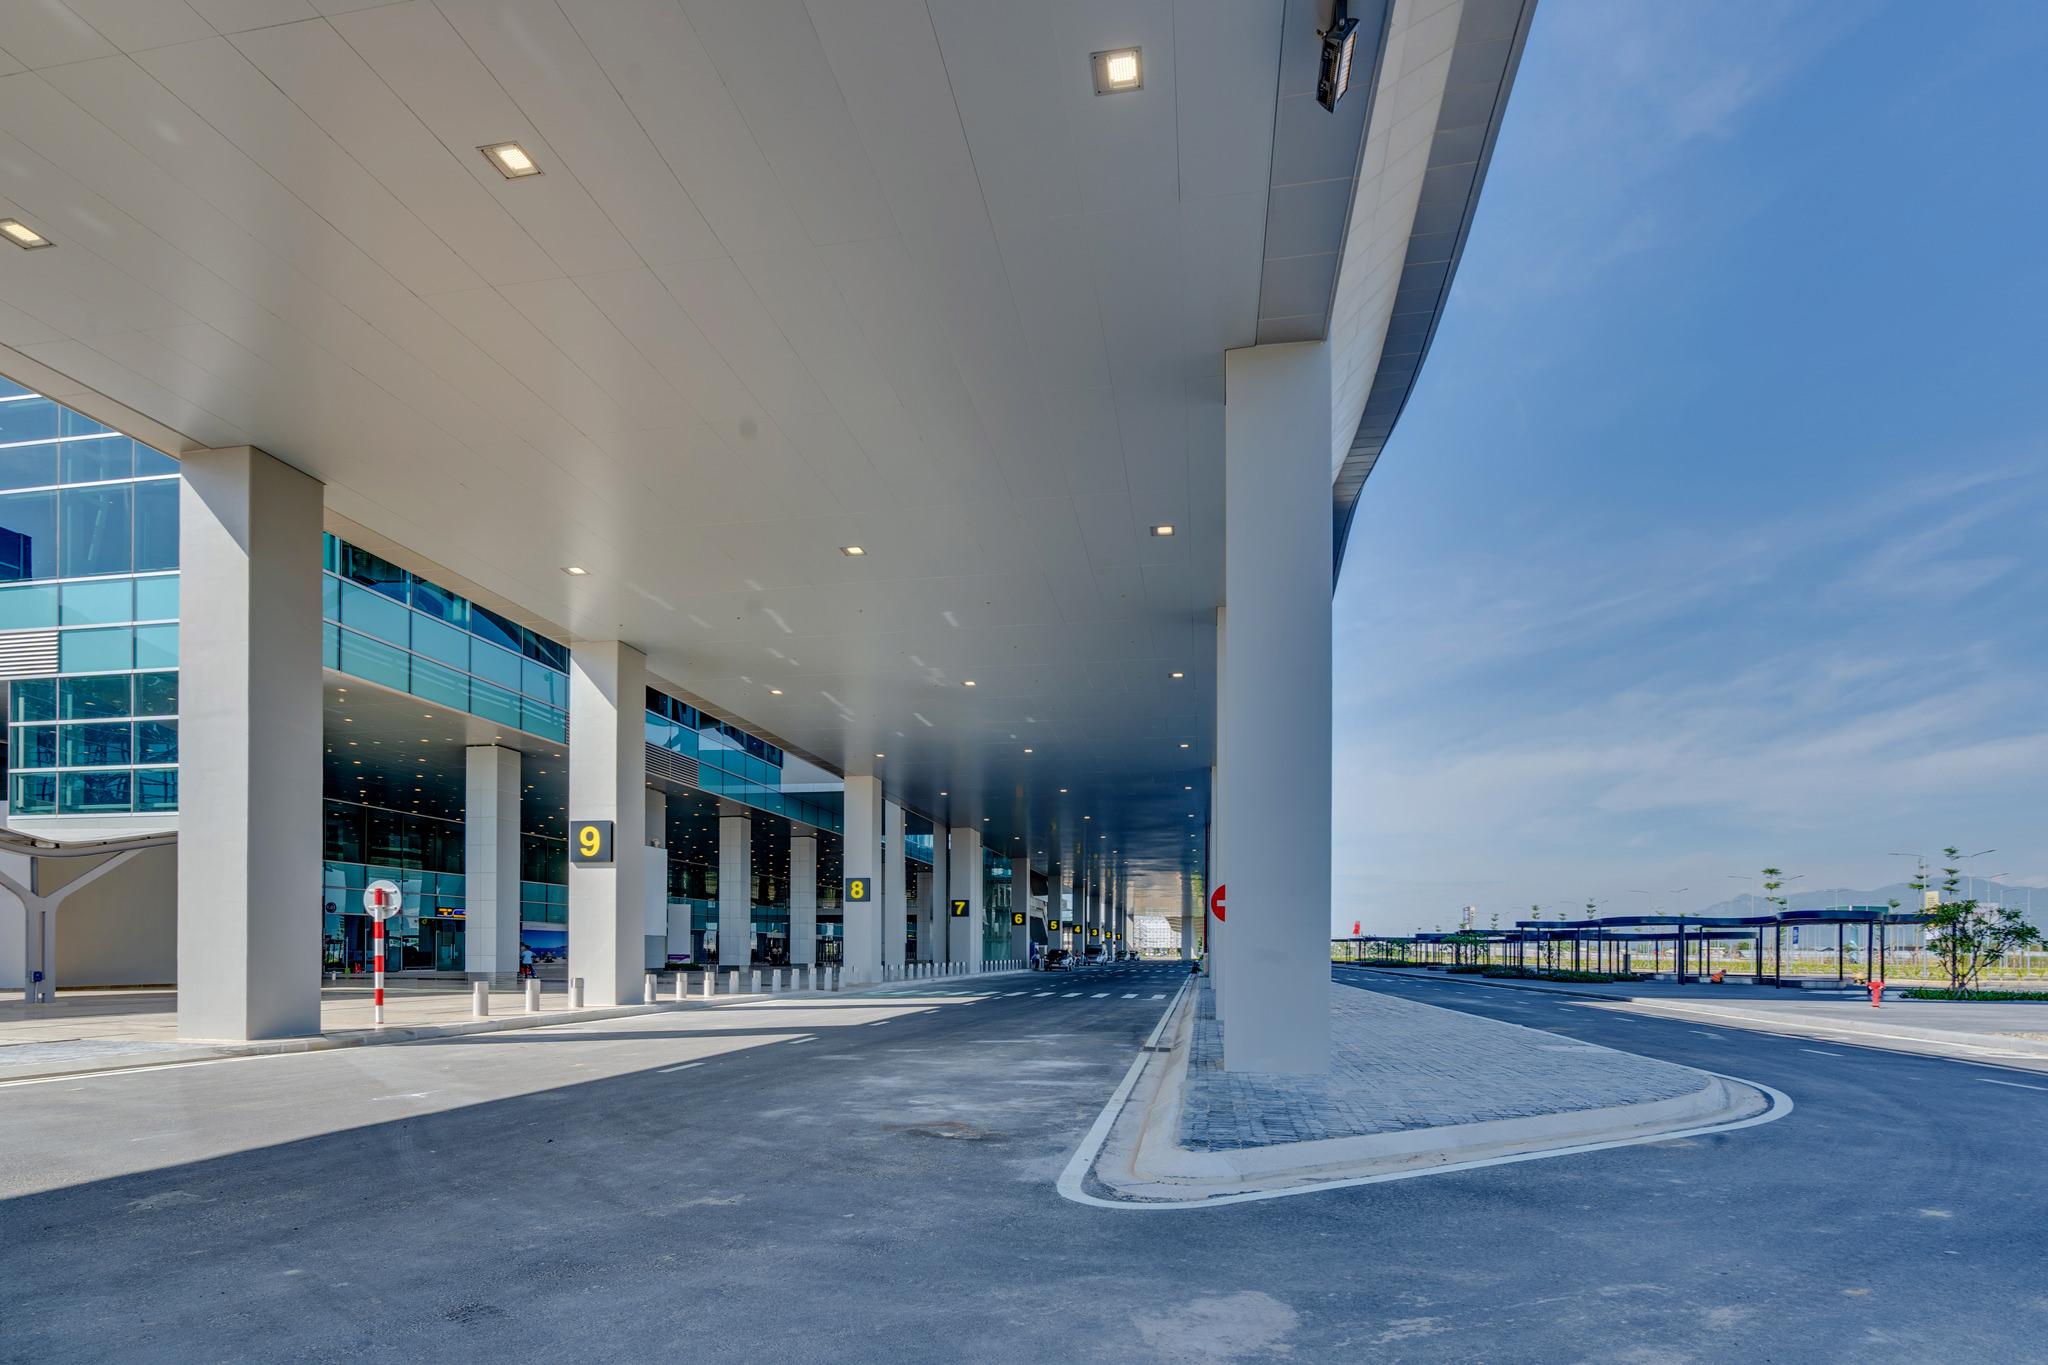 20180626 - Cam Ranh Airport - Architecture - 0235.jpg